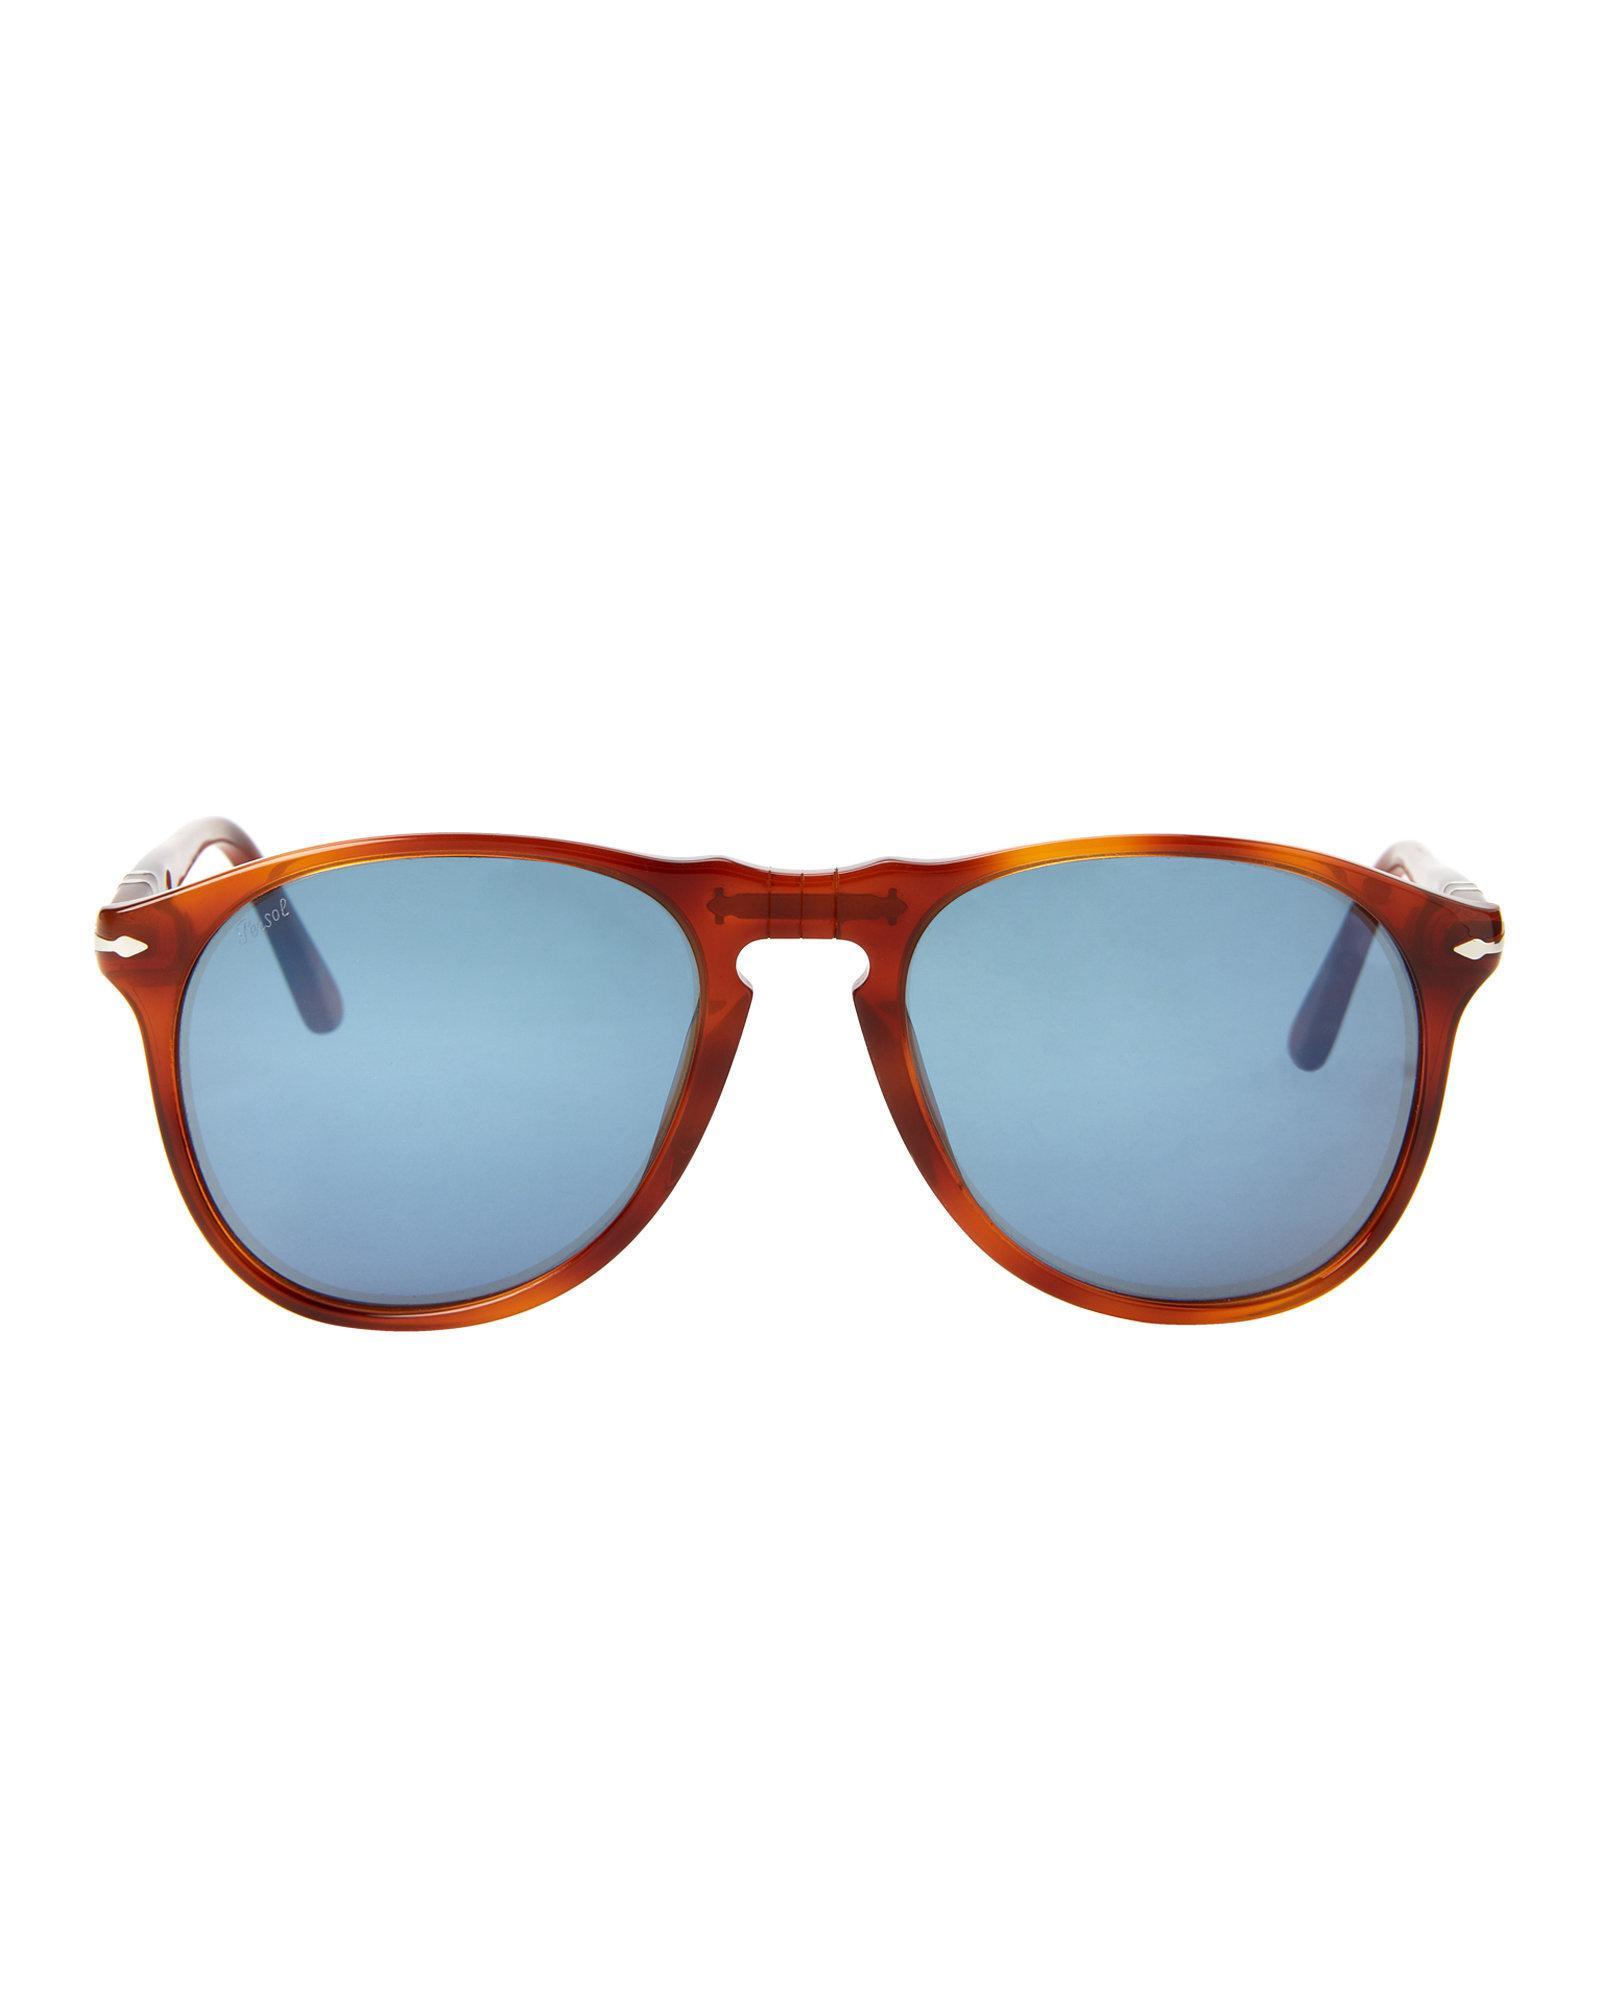 d3d4b79a74c06 Lyst - Persol Po9649 Terra Di Siena Round Sunglasses